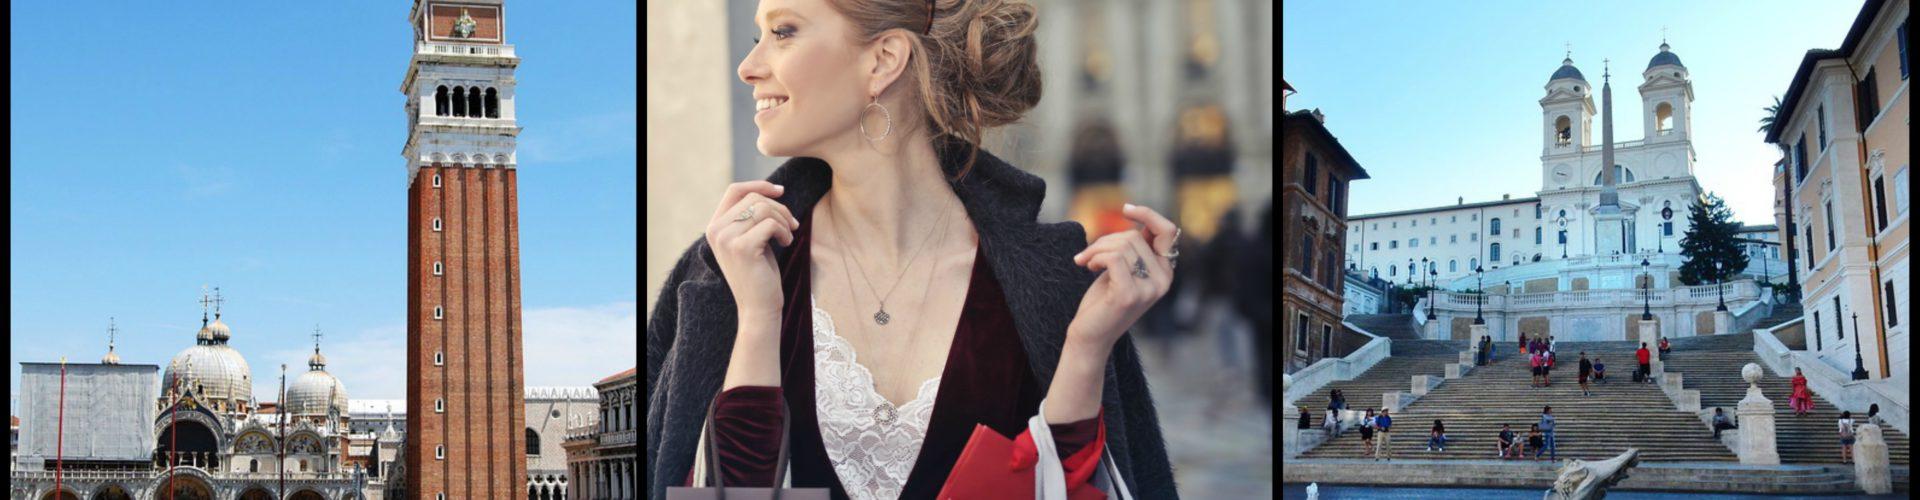 Italian clothing stores vie della moda - italian clothign stores